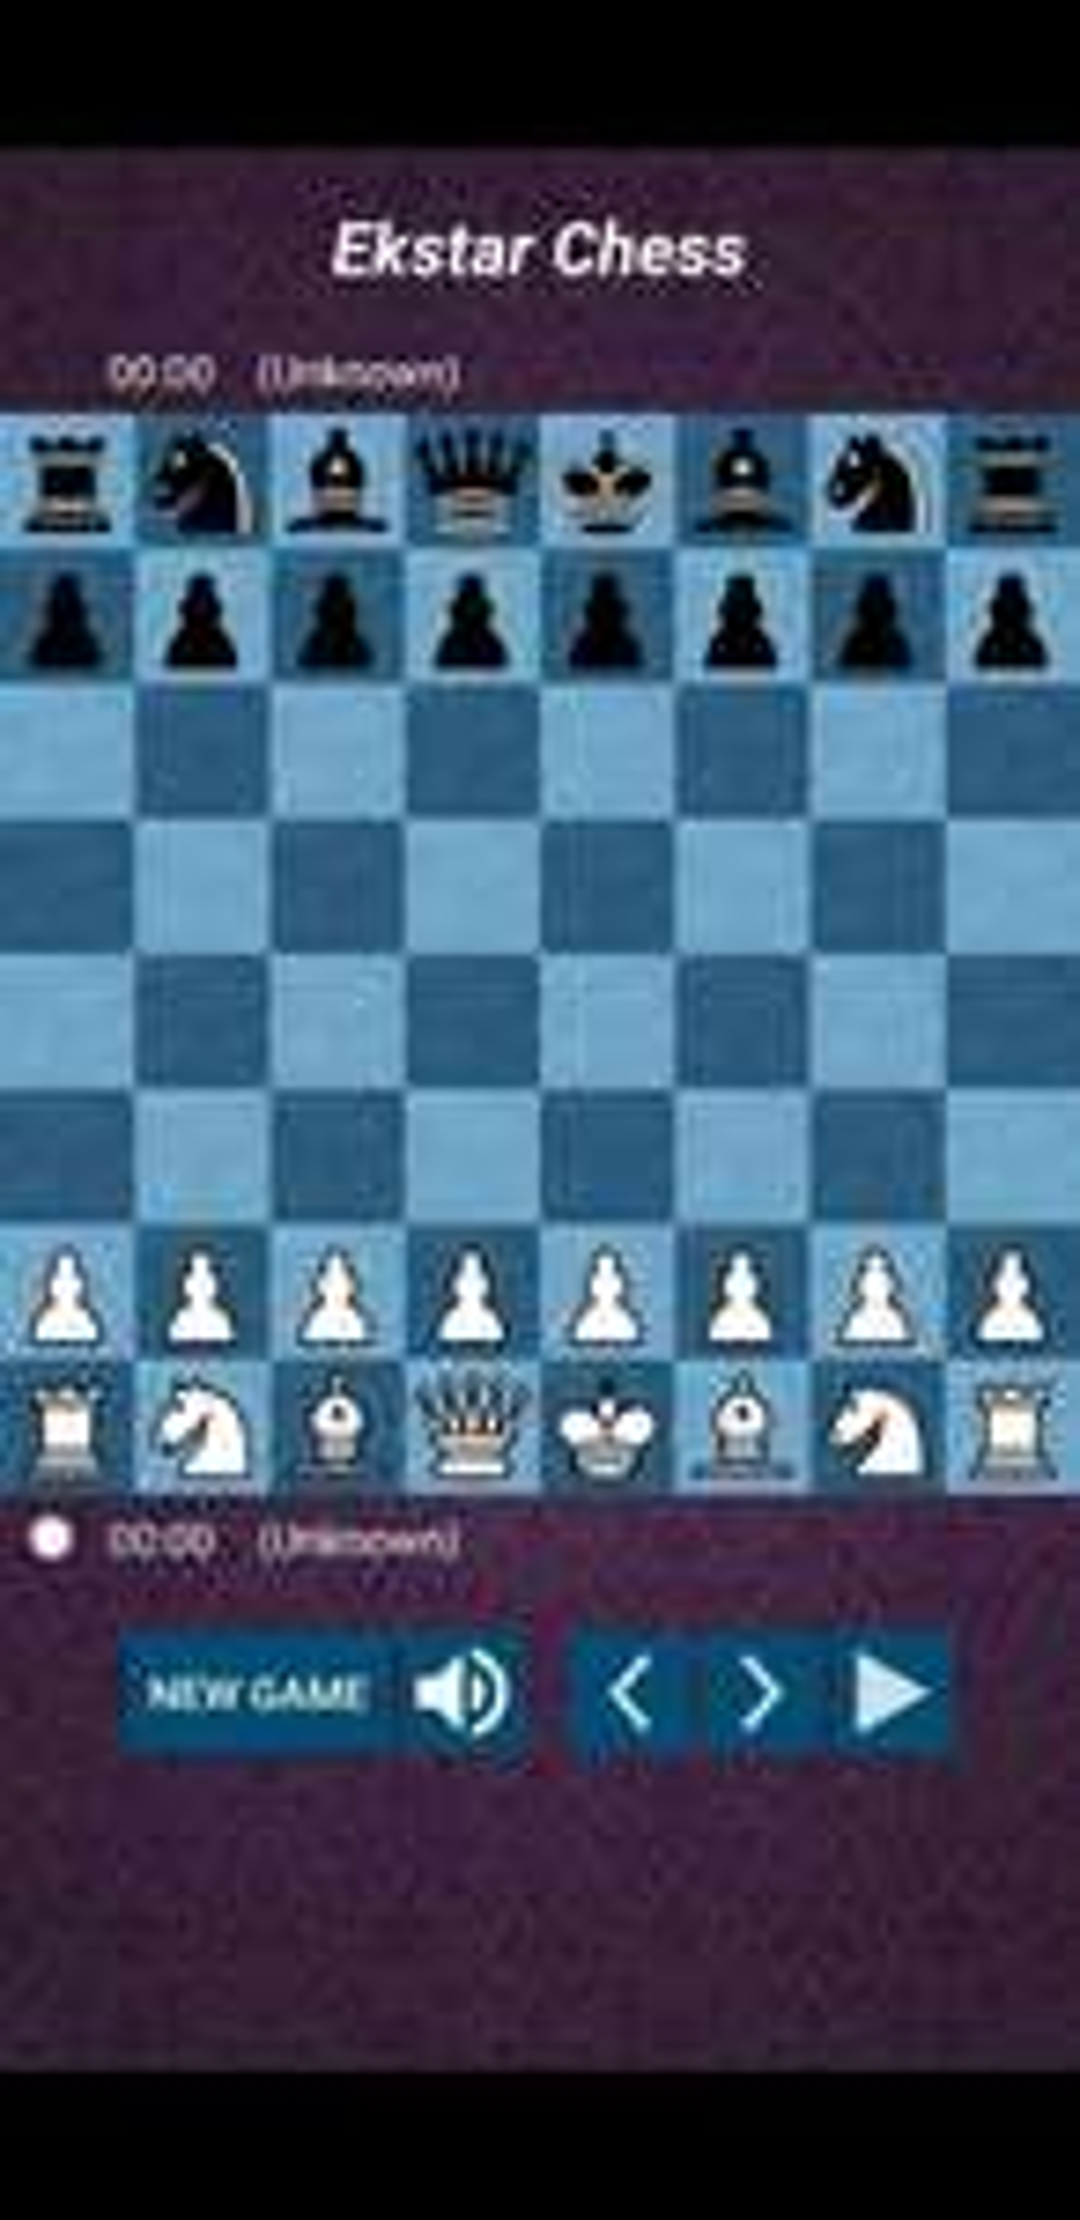 EKSTAR CHESS w google play (szachy)